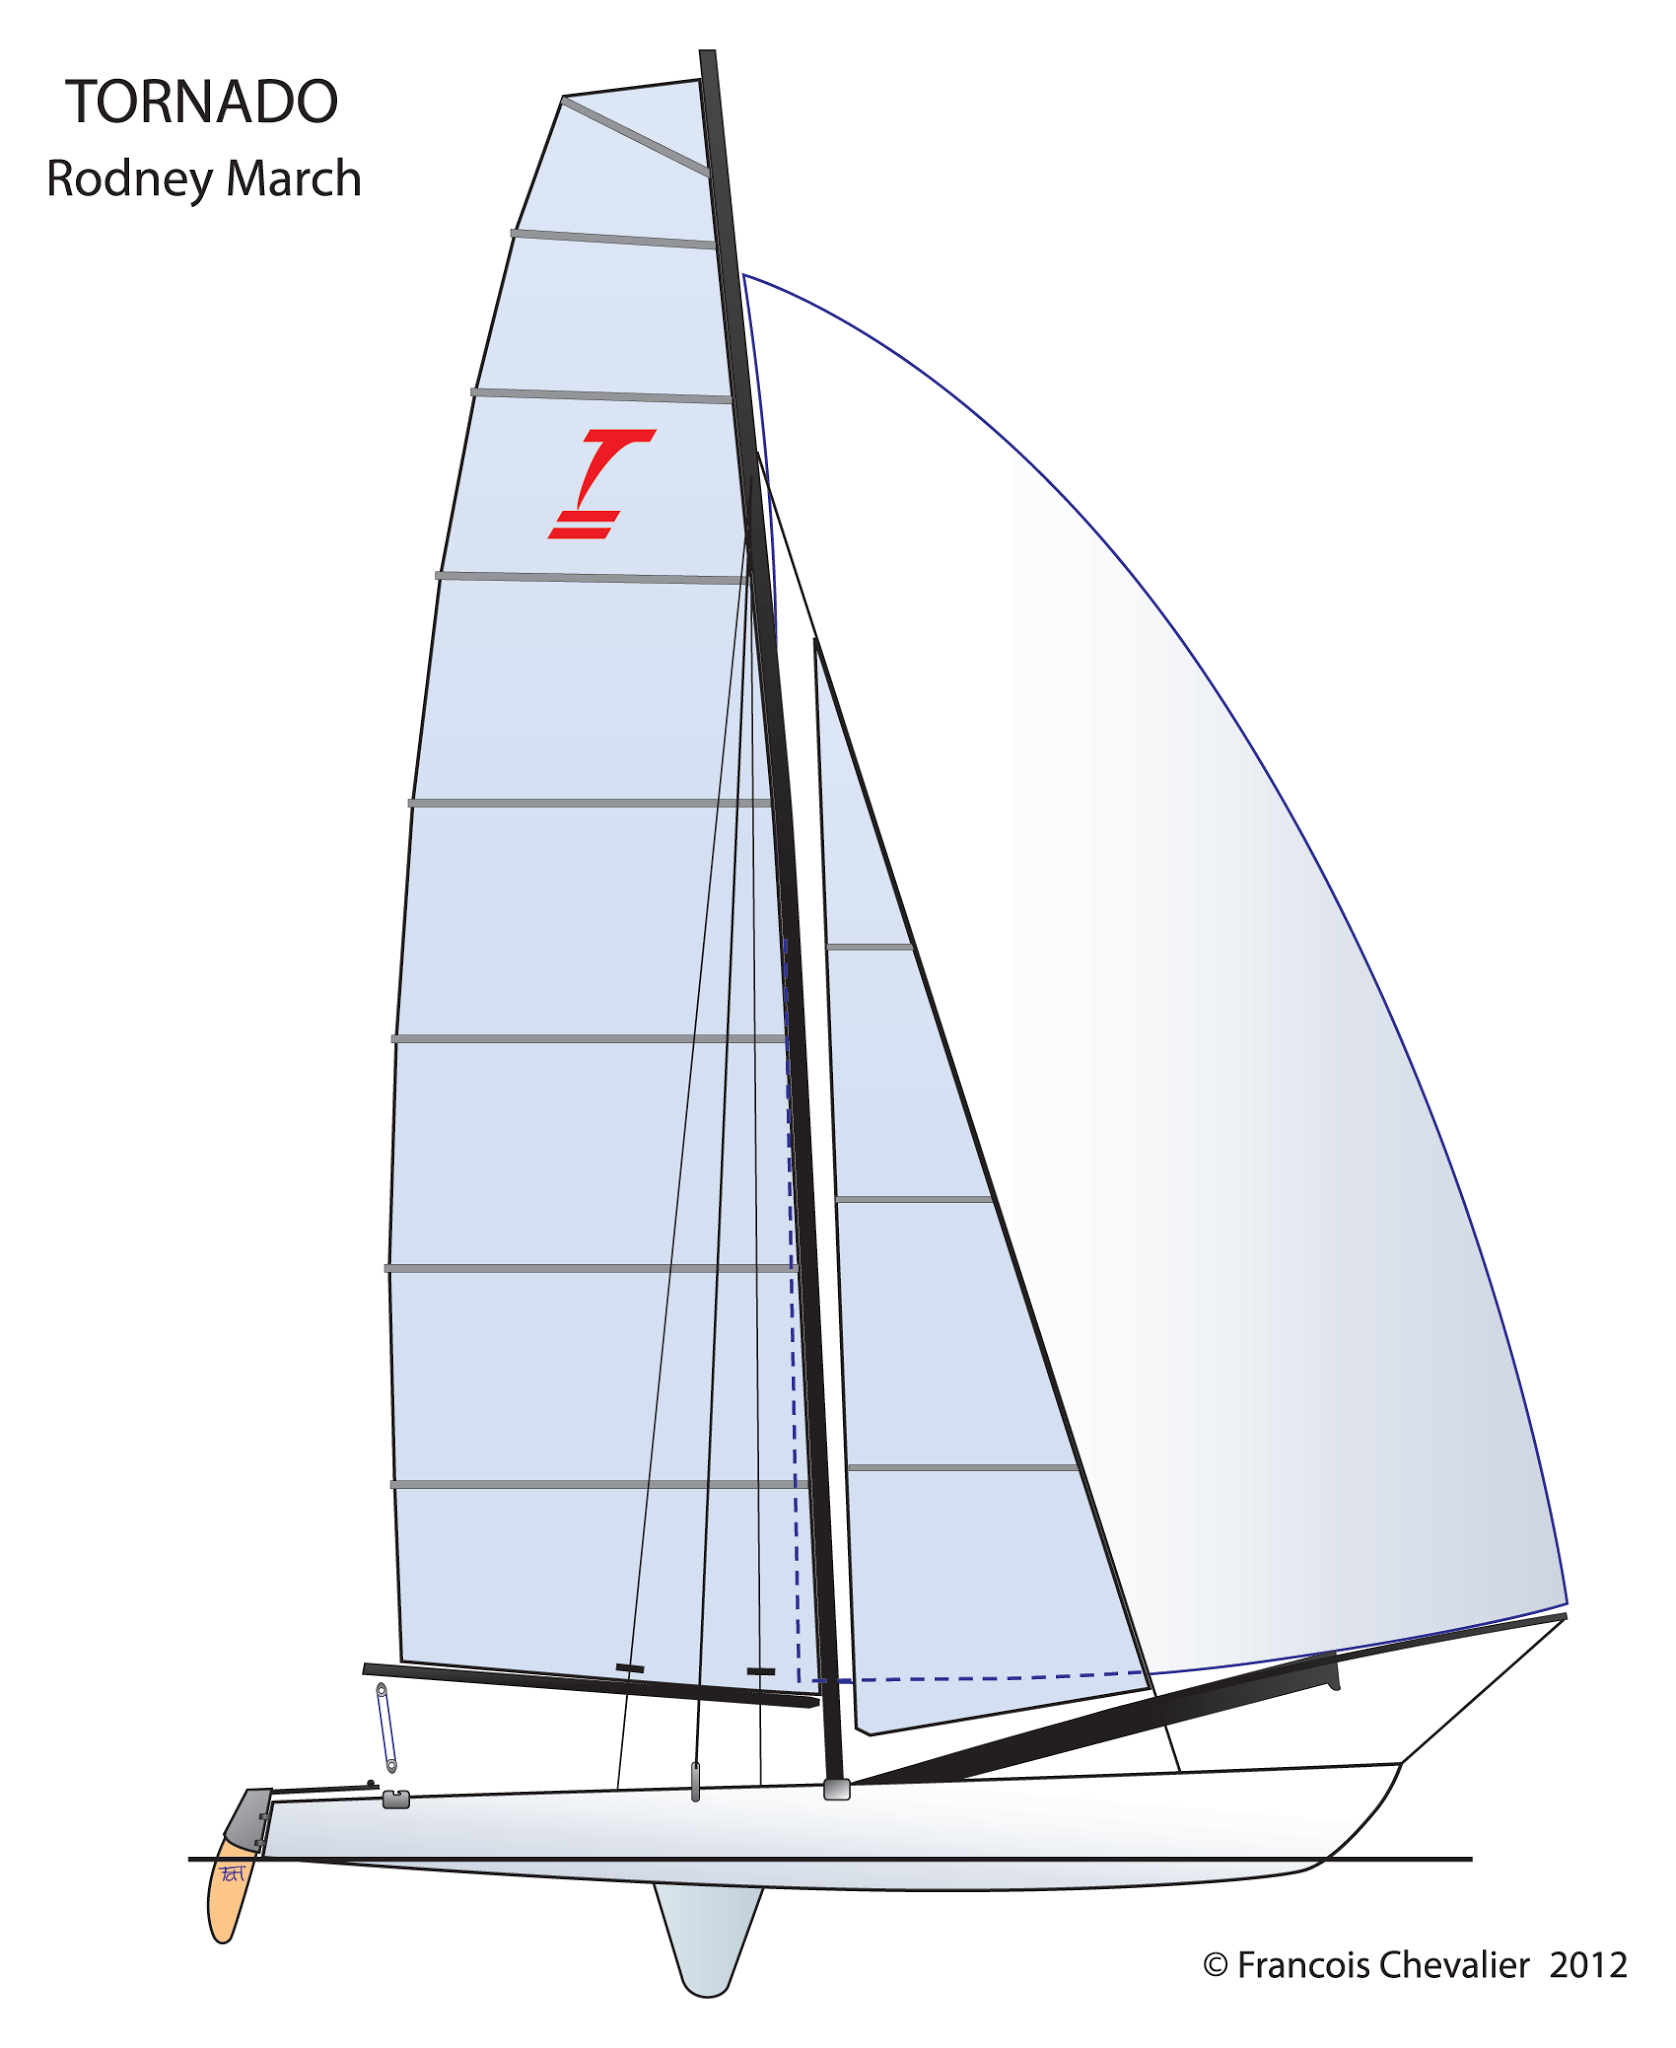 Donan Raven's Sailing Trivia: The Evolution of Sailing